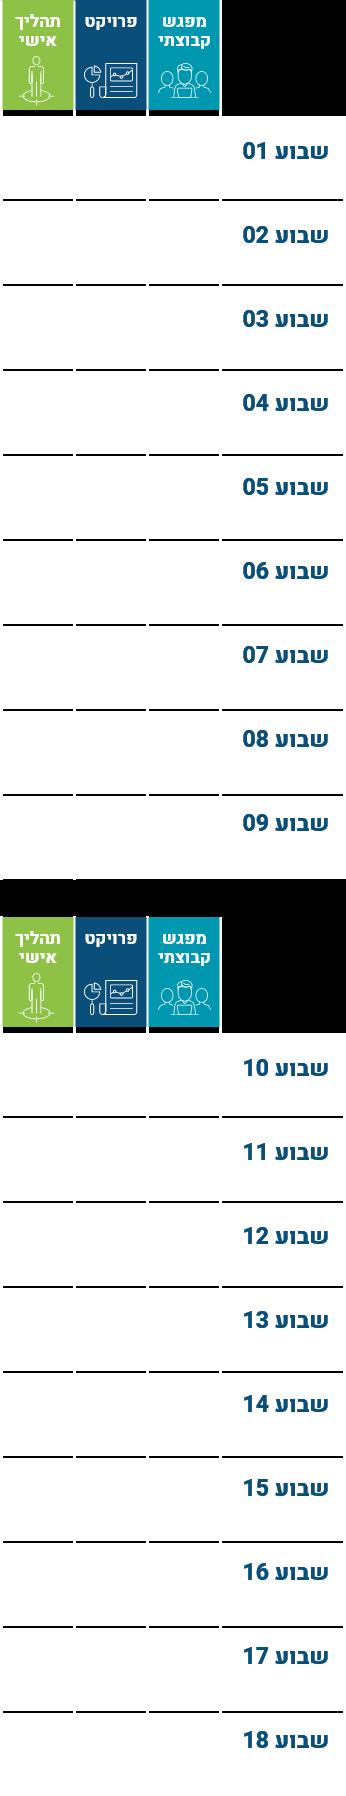 innovation_leaders_shcedule_mobile_image